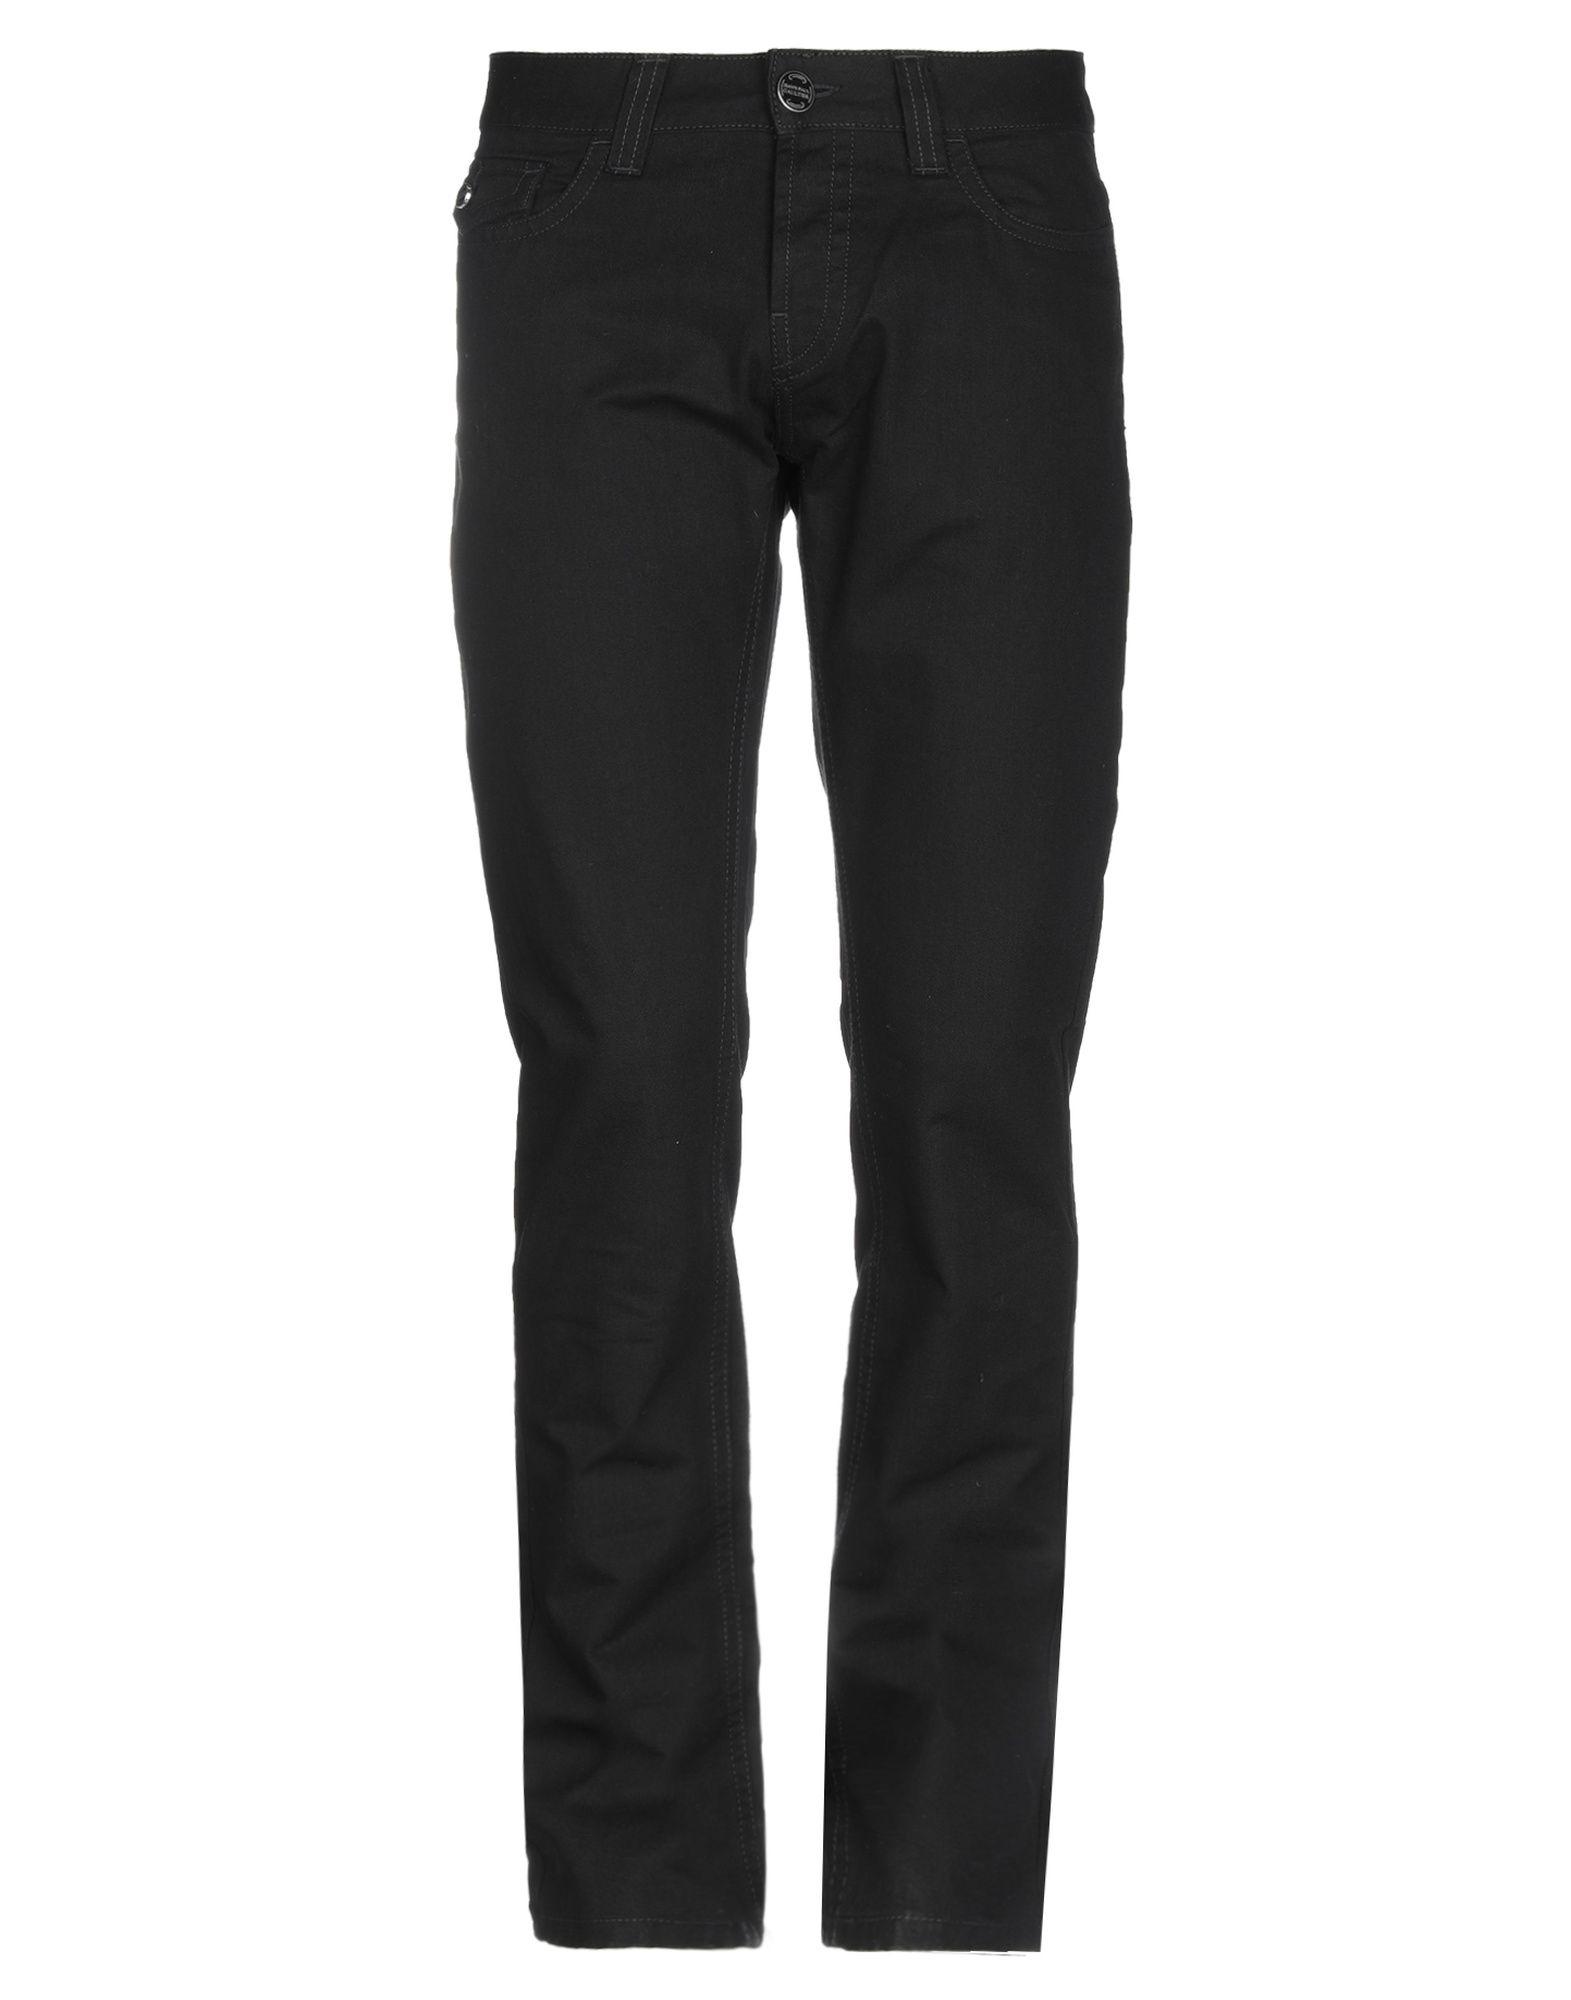 Фото - JEAN'S PAUL GAULTIER Джинсовые брюки jean paul gaultier le male